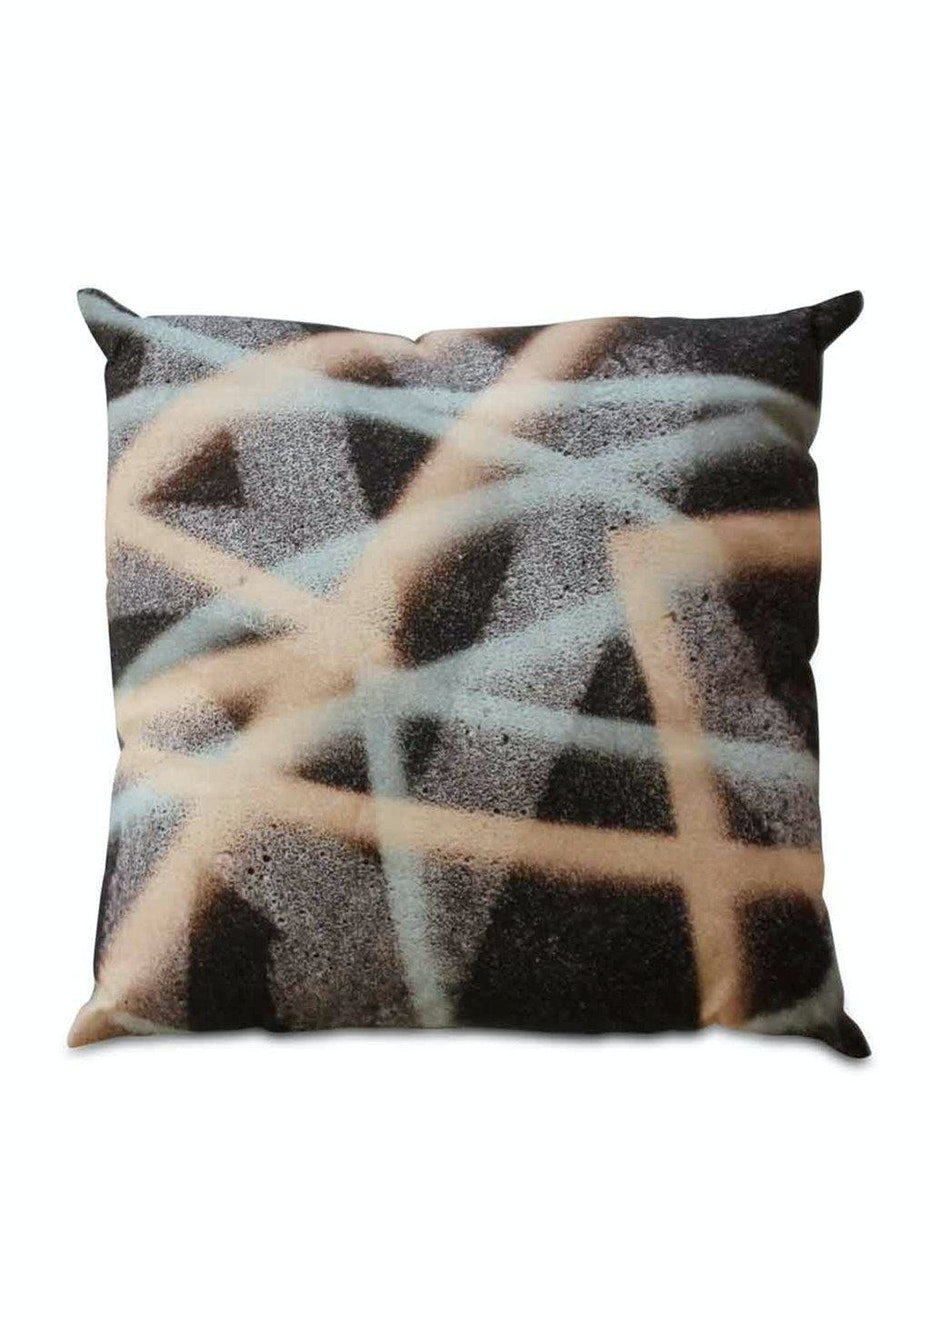 Me & My Trend - Graffiti Blush & Blue Cushion